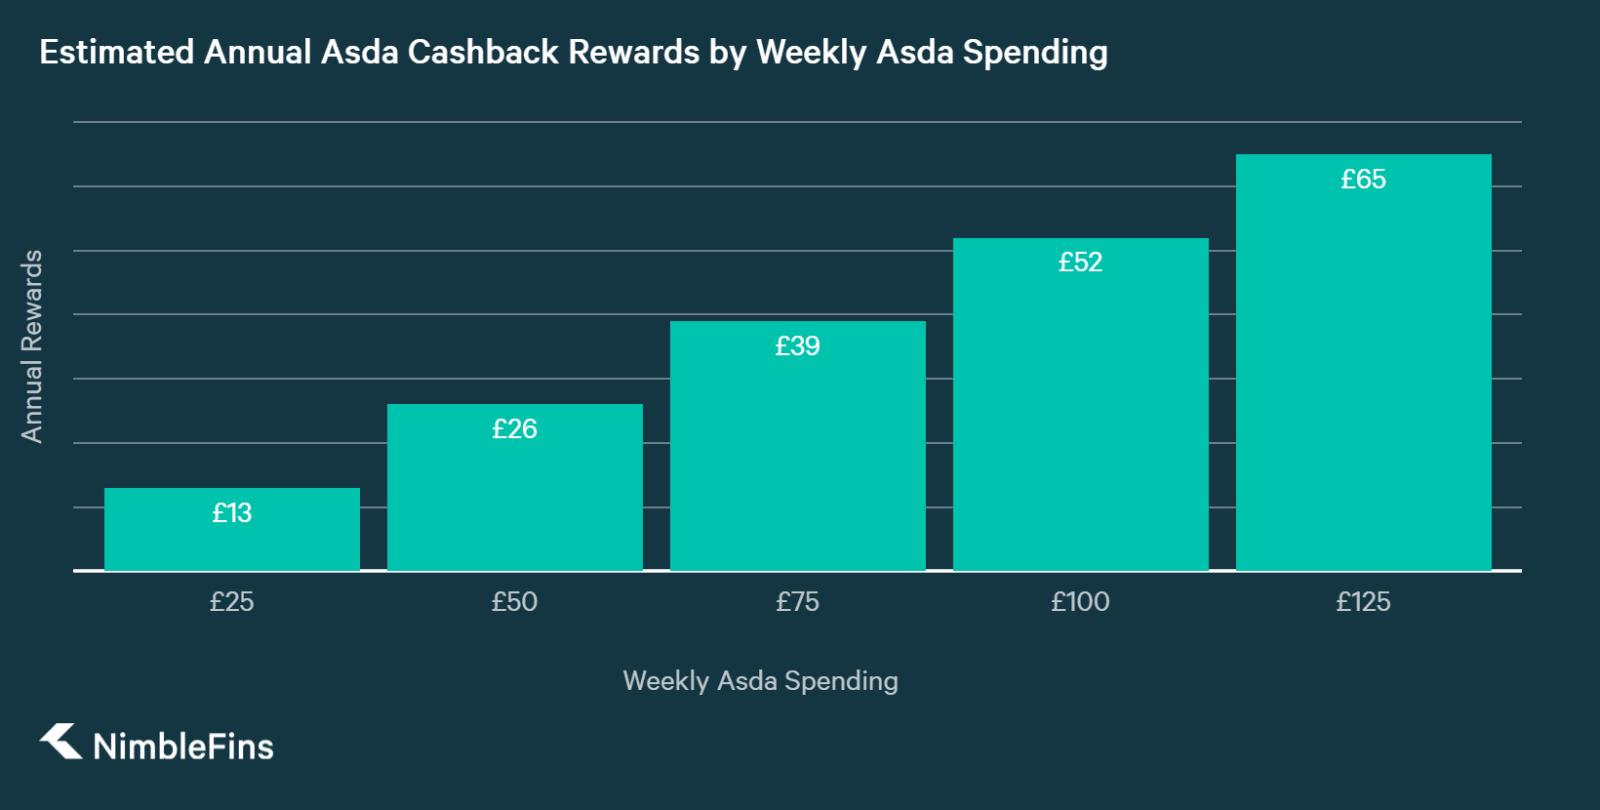 chart showing Potential Rewards on Asda Cashback Card Based on Weekly Asda Spending